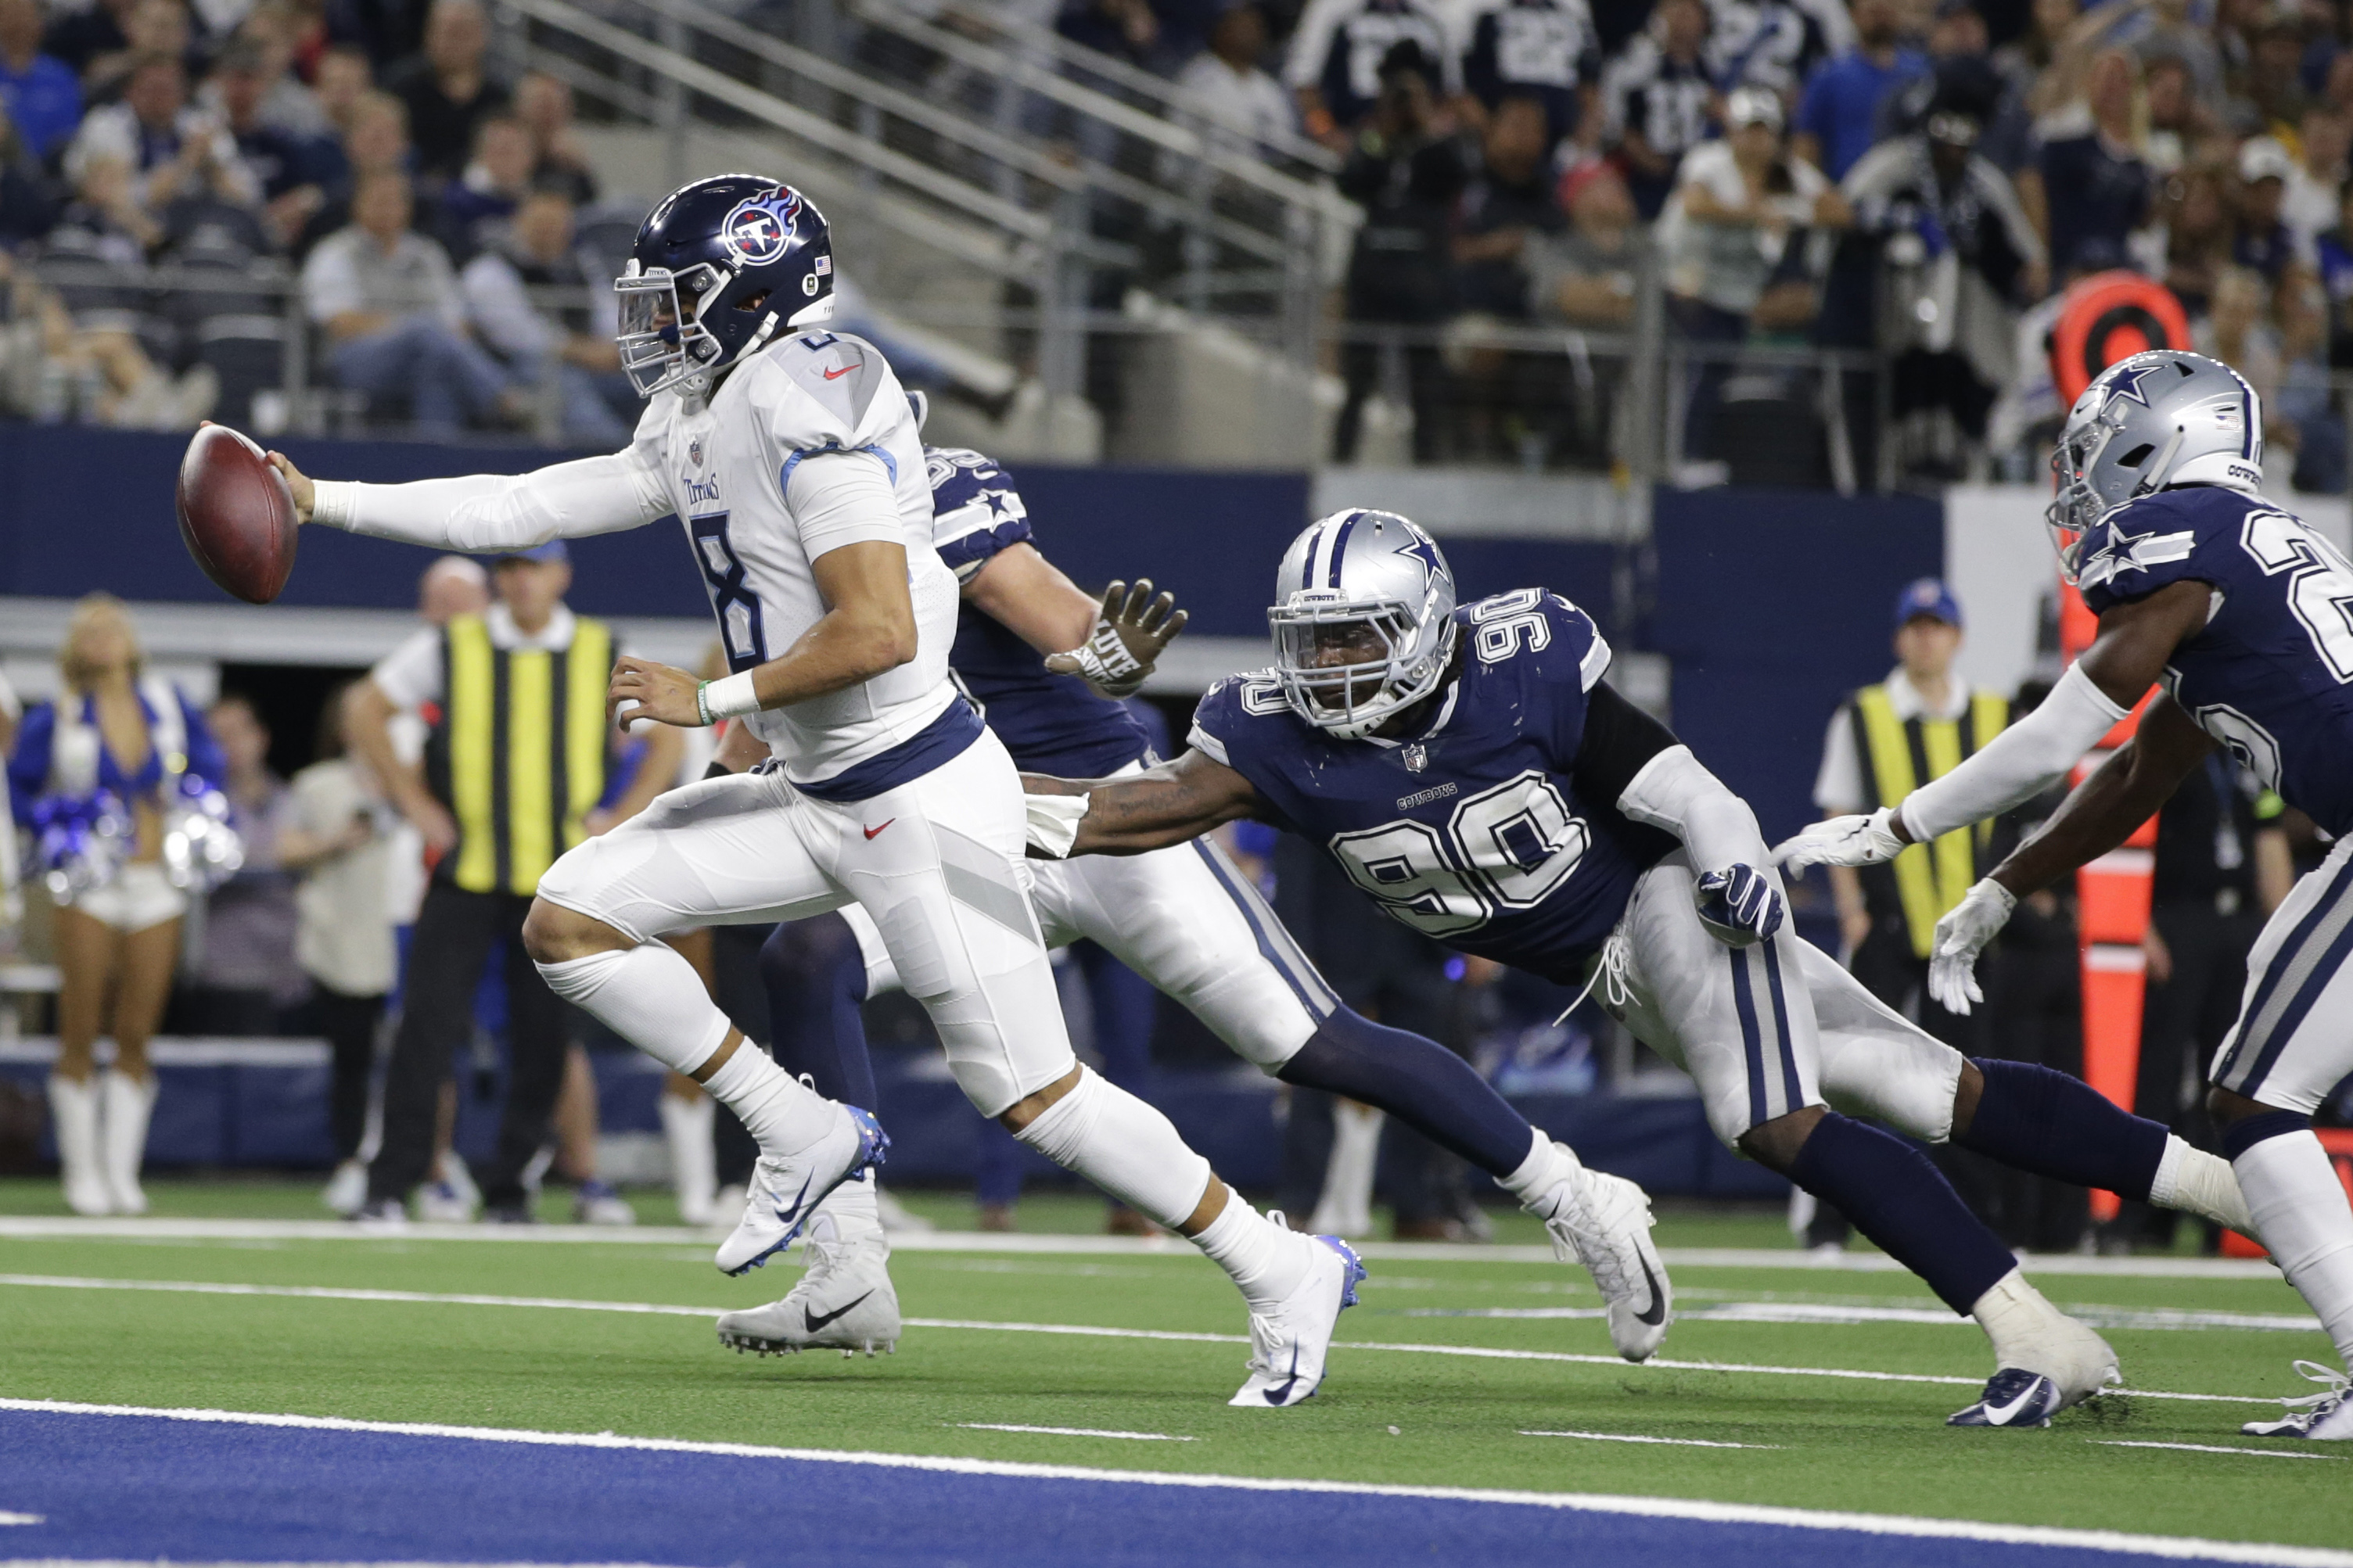 Nov 5, 2018; Arlington, TX, USA; Tennessee Titans quarterback Marcus Mariota (8) scores a touchdown in the third quarter against the Dallas Cowboys at AT&T Stadium. Mandatory Credit: Tim Heitman-USA TODAY Sports